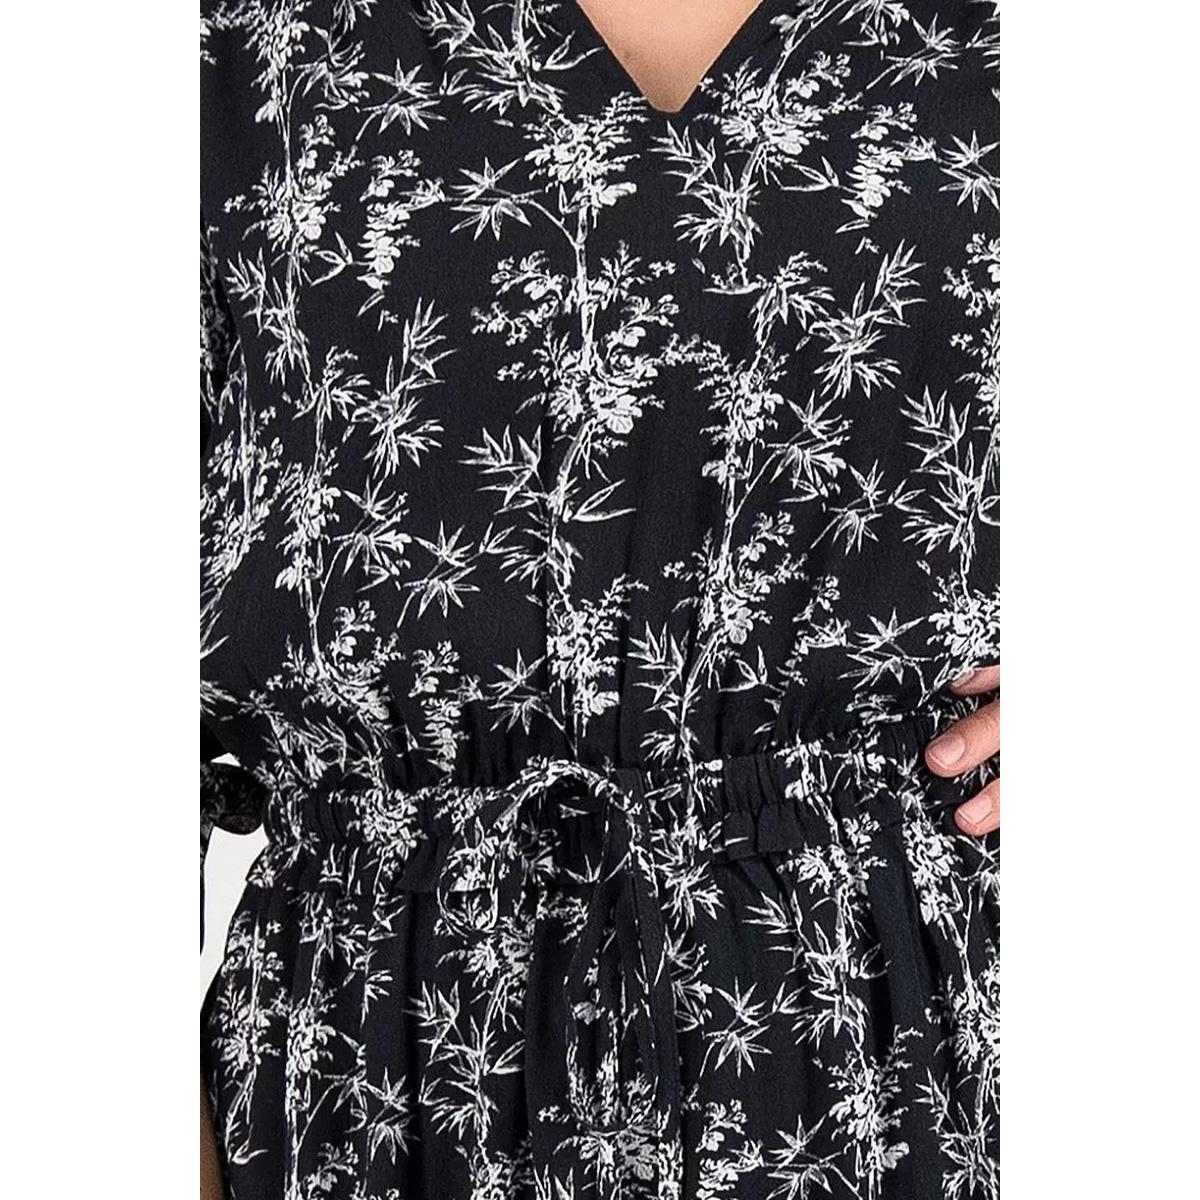 marlin dress s20 99 3055 circle of trust jurk black bamboo